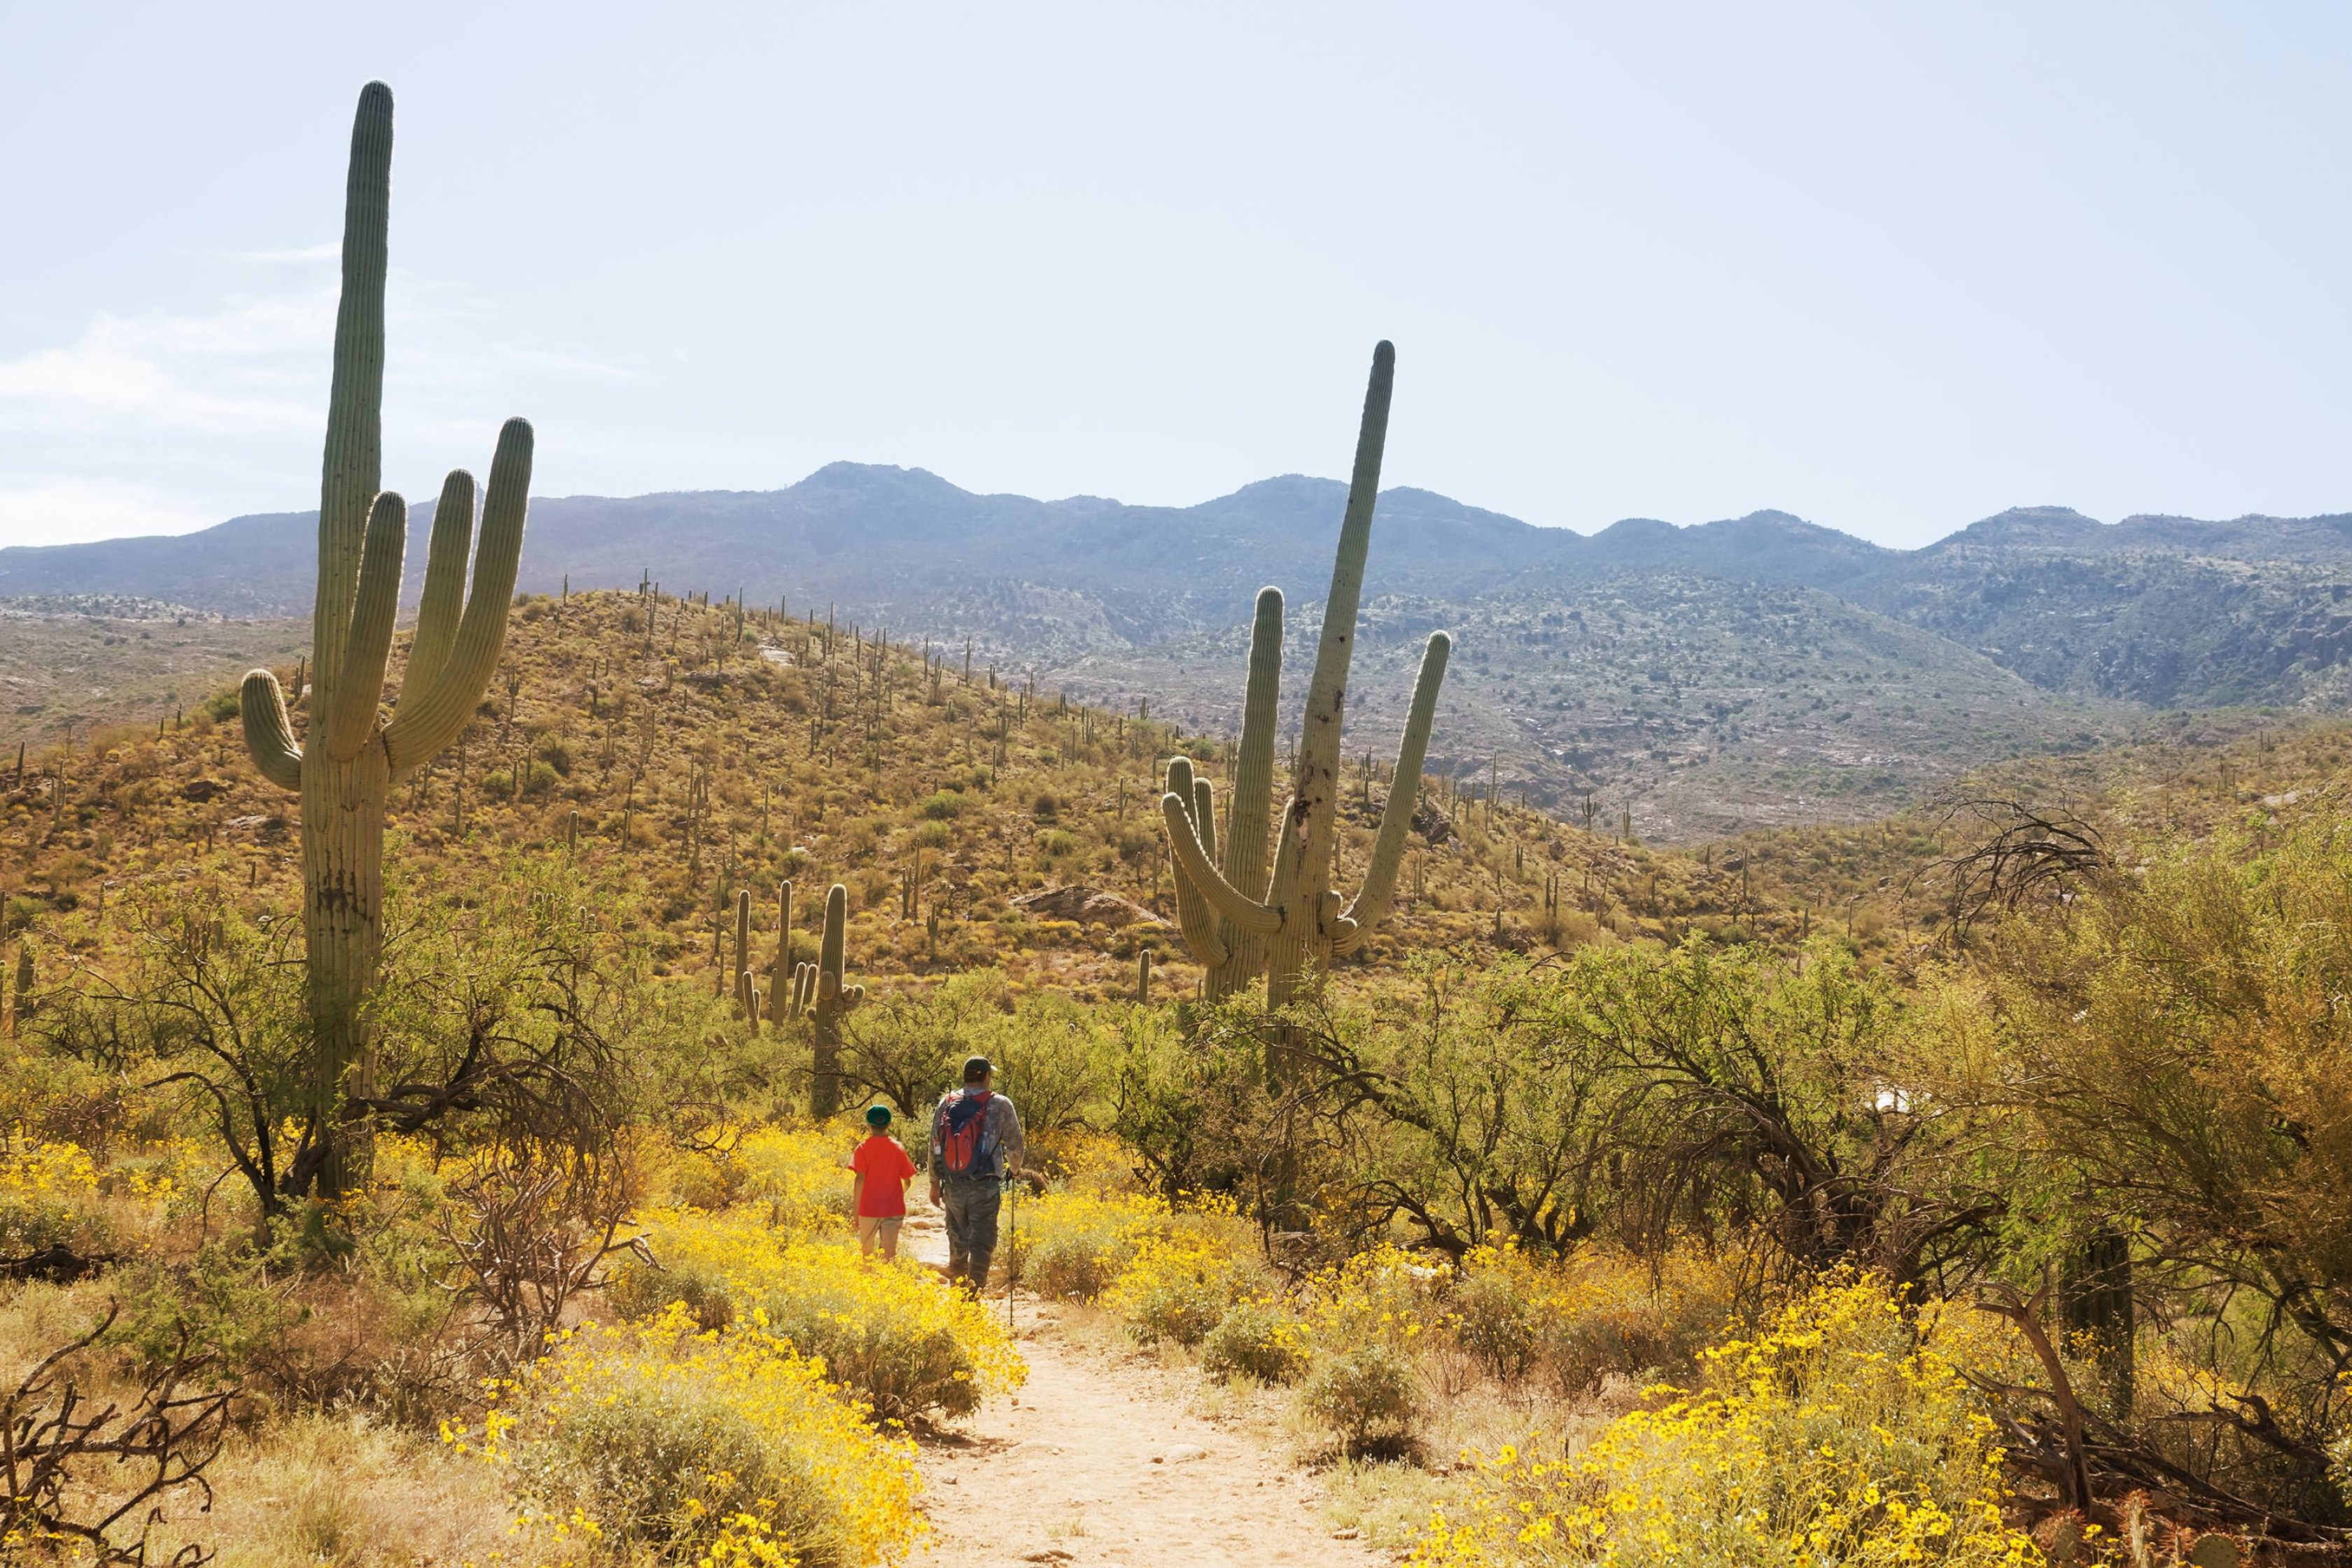 A father and son walk through cacti at Saguaro.